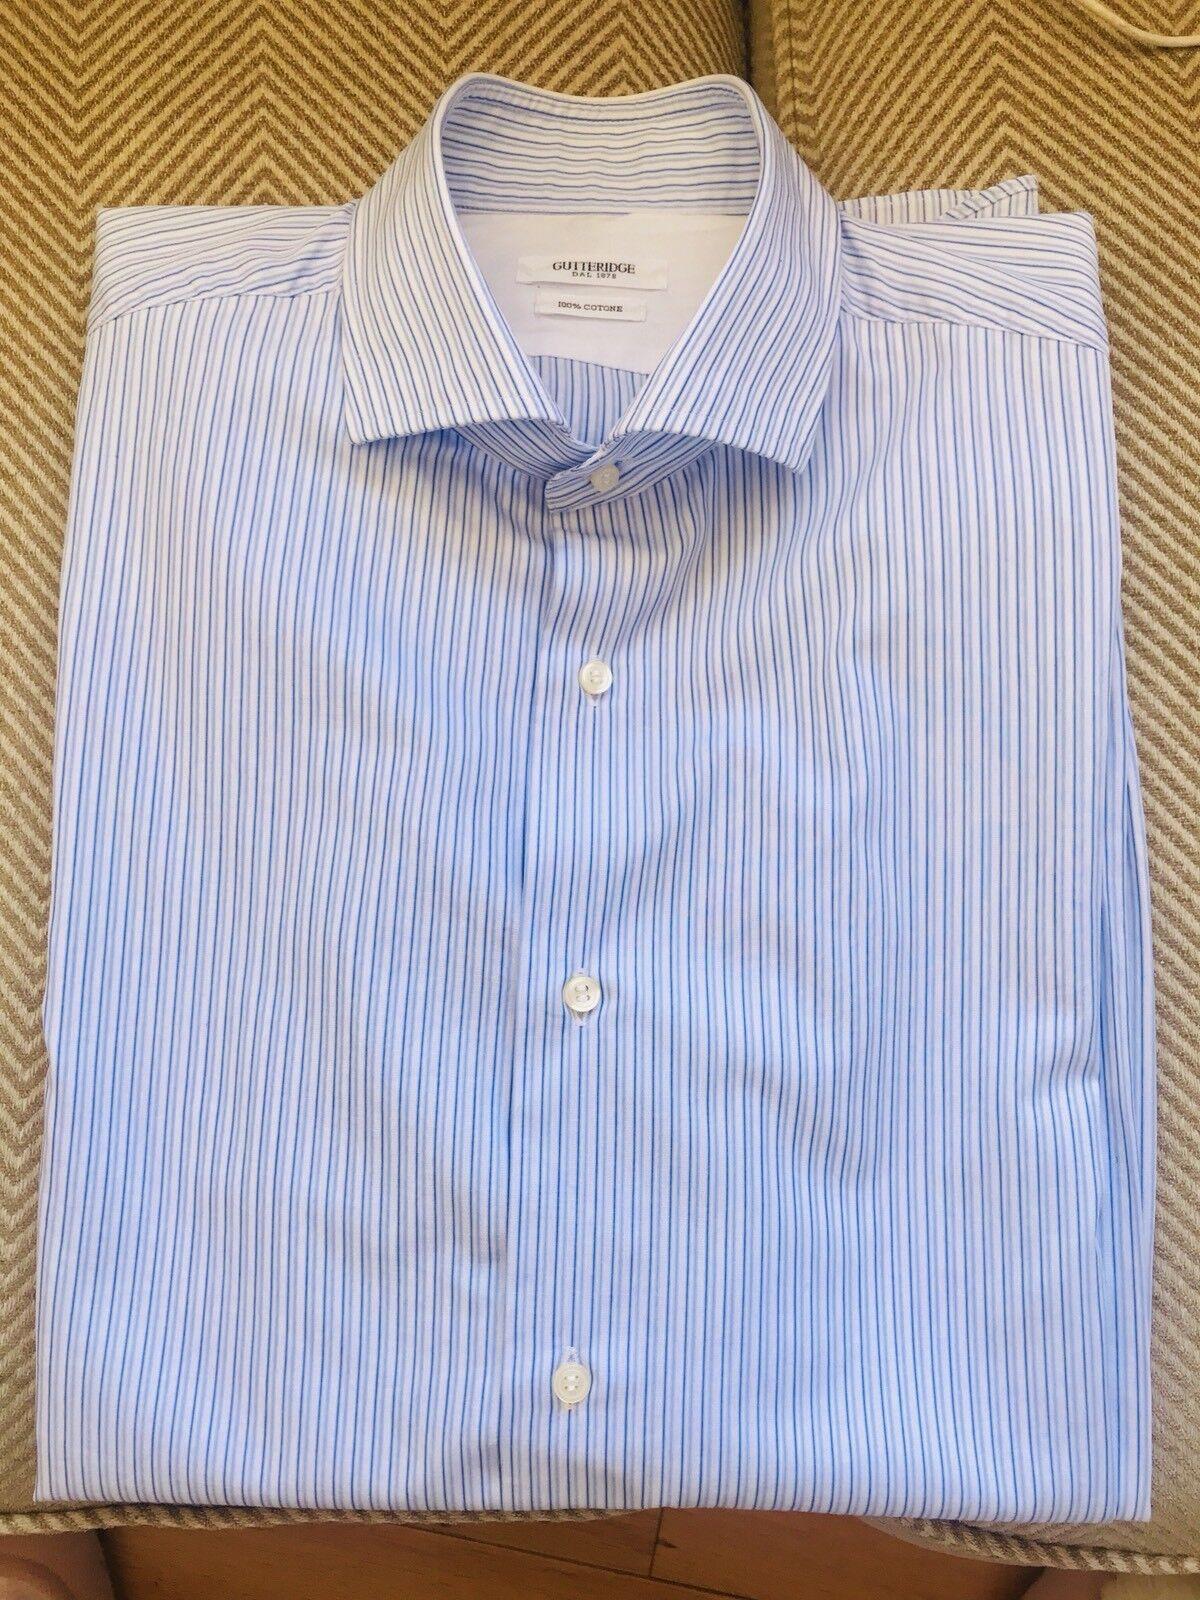 ITALIAN GUTTERIDGE 100% cotton men's long sleeves striped shirt size 42 ( 16.5 )